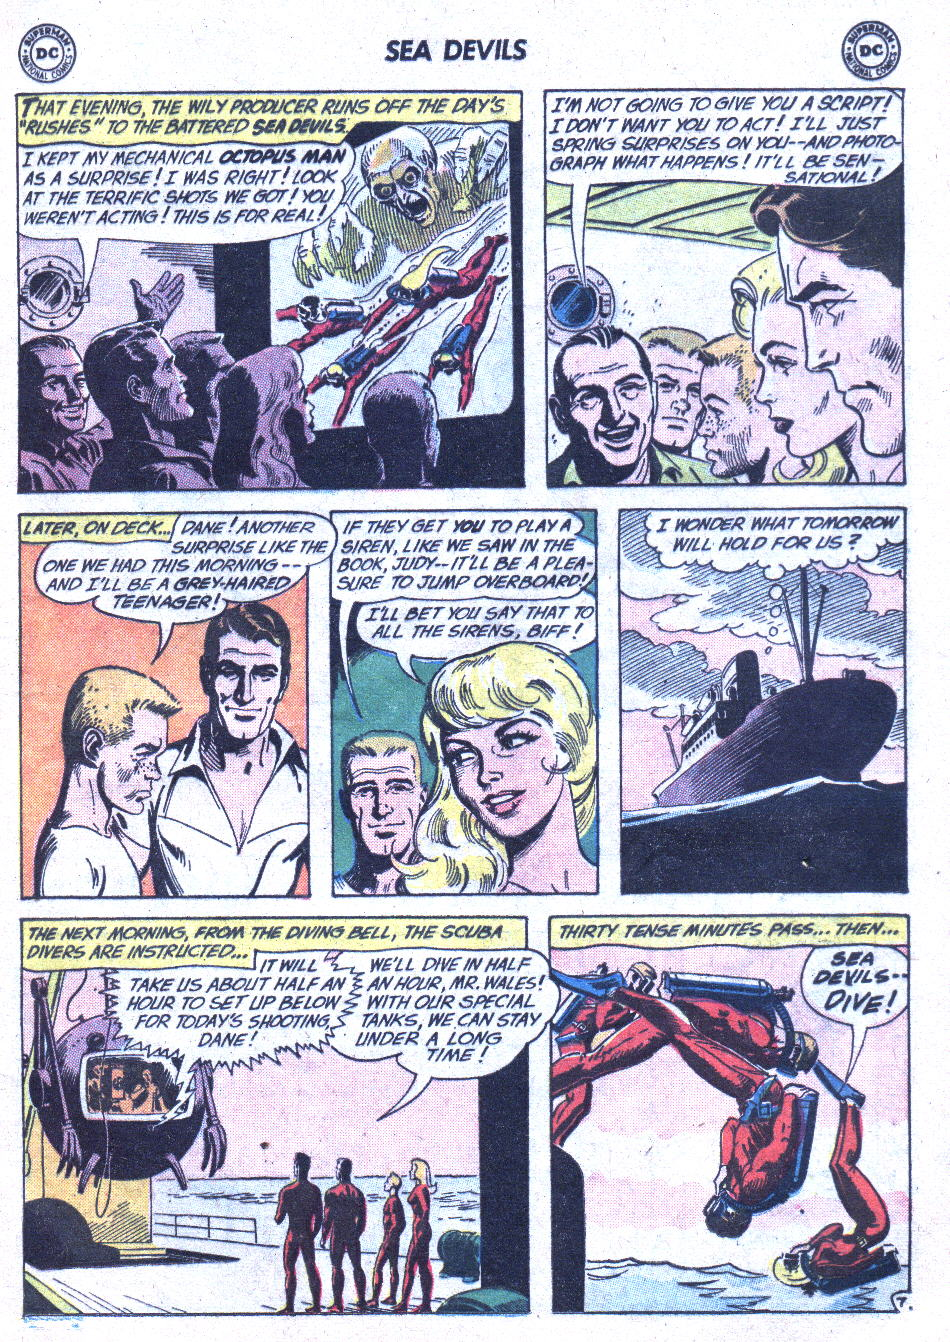 Read online Sea Devils comic -  Issue #1 - 10